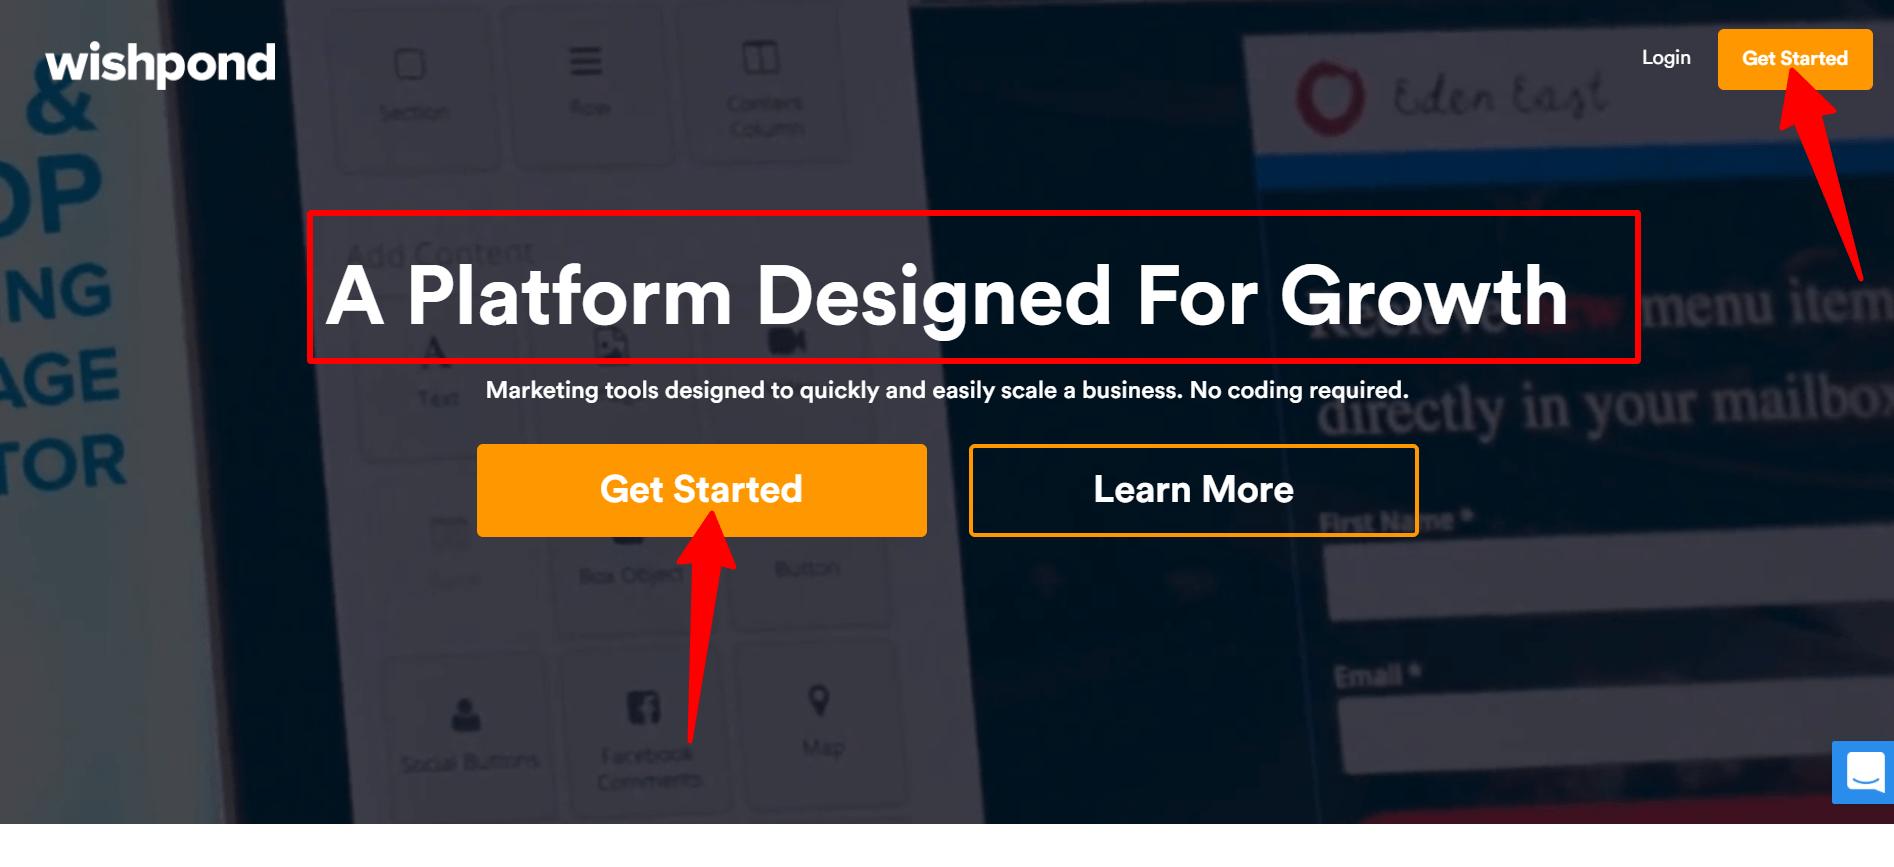 Wishpond-Marketing-Made-Simple